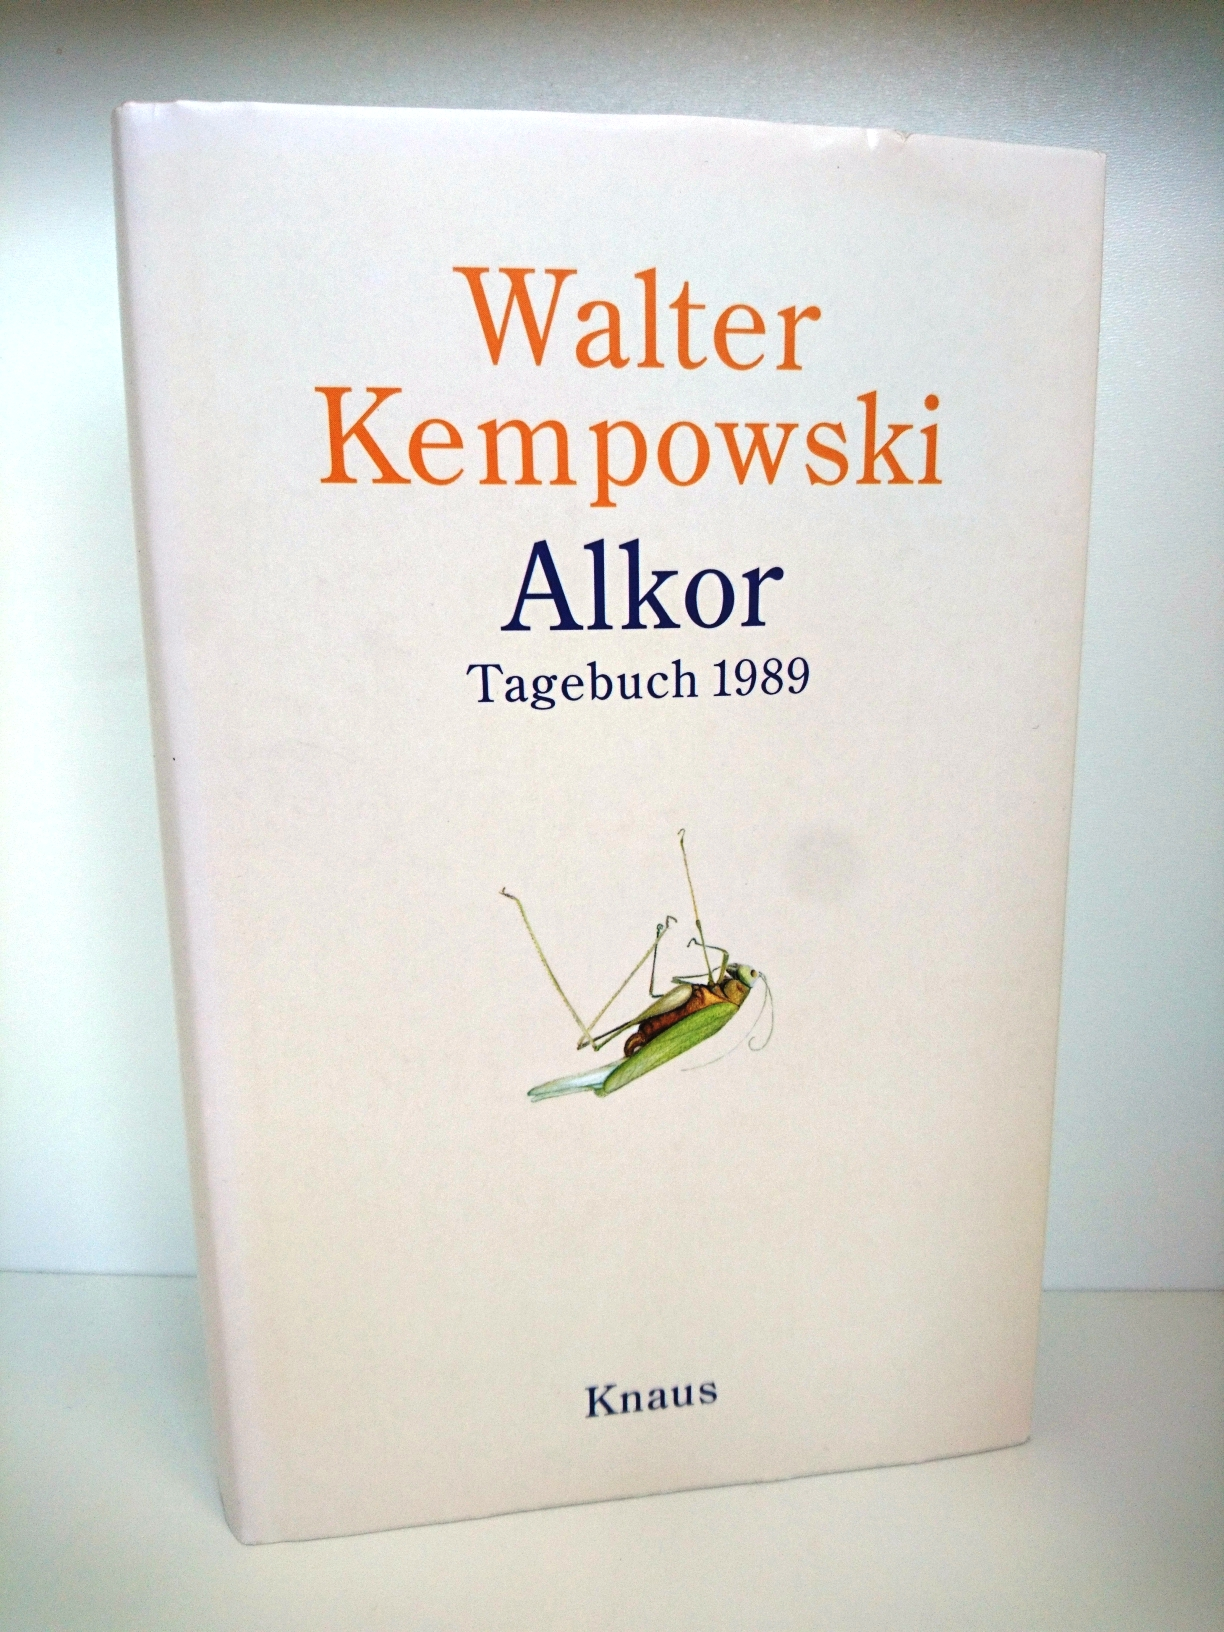 Alkor Tagebuch 1989: Walter Kempowski